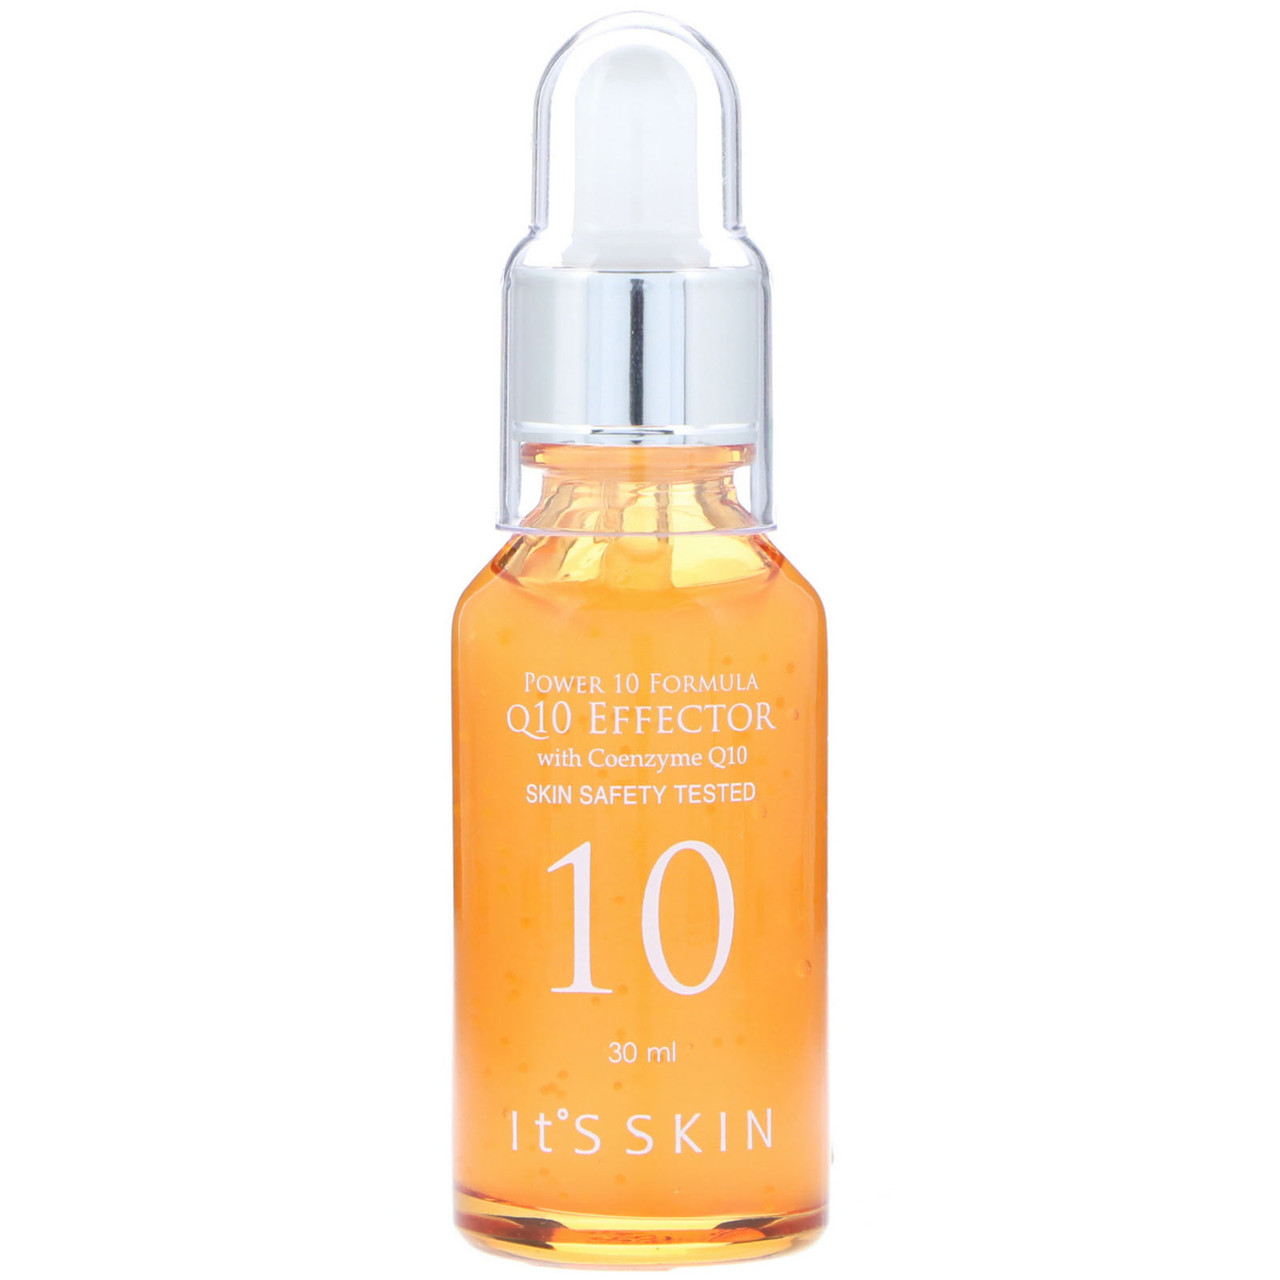 It's Skin, Сыворотка для лица с коэнзимом Q10 Power 10 Formula Q10 Effector, 30мл